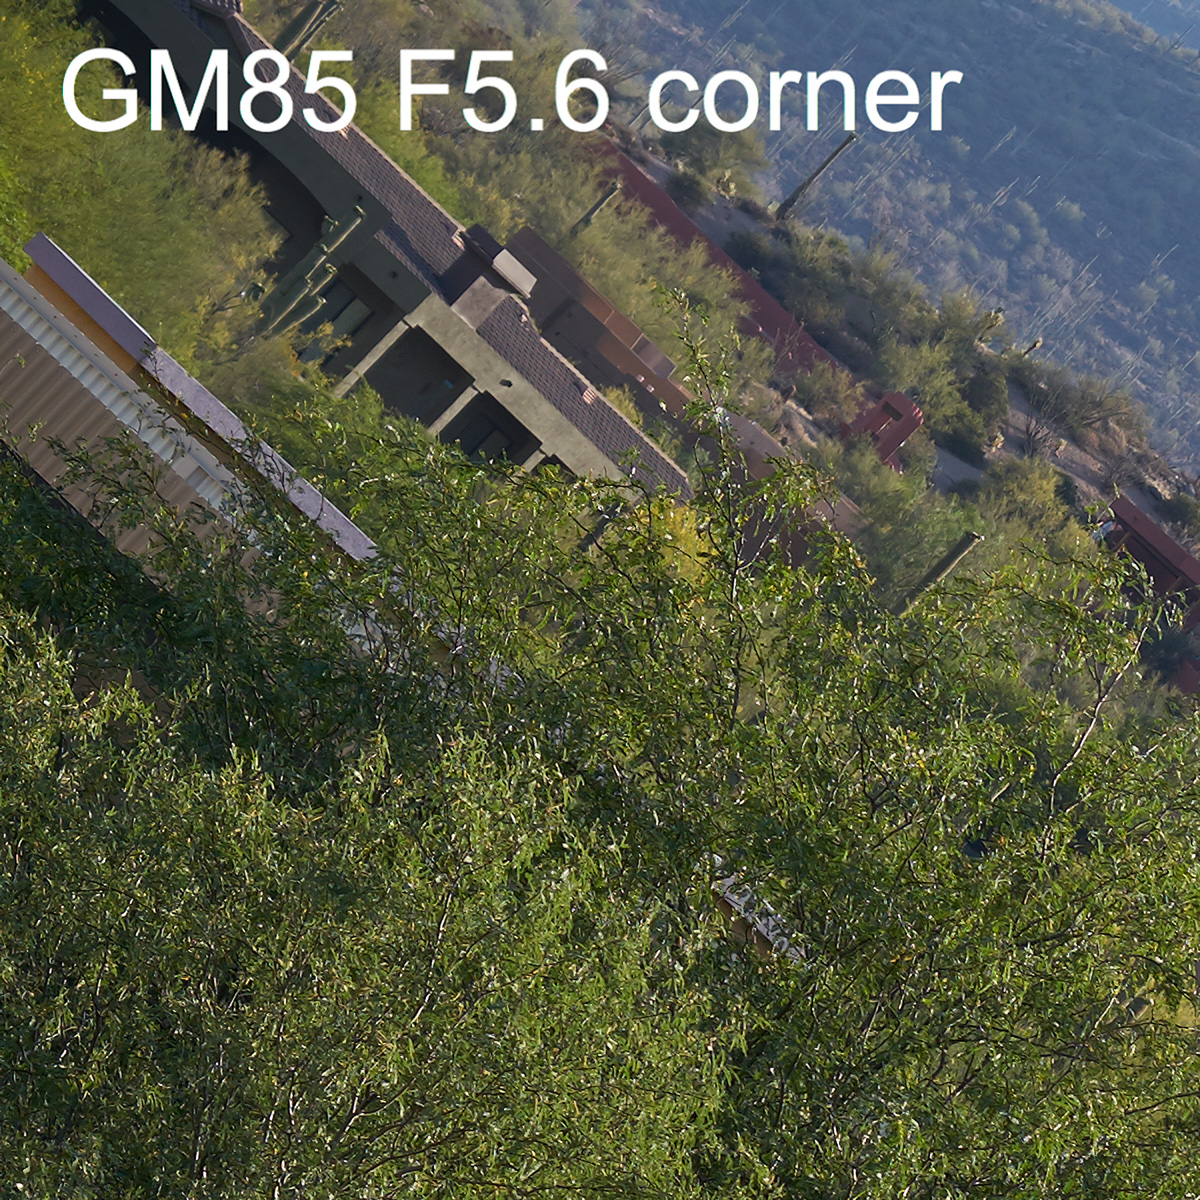 gm 56